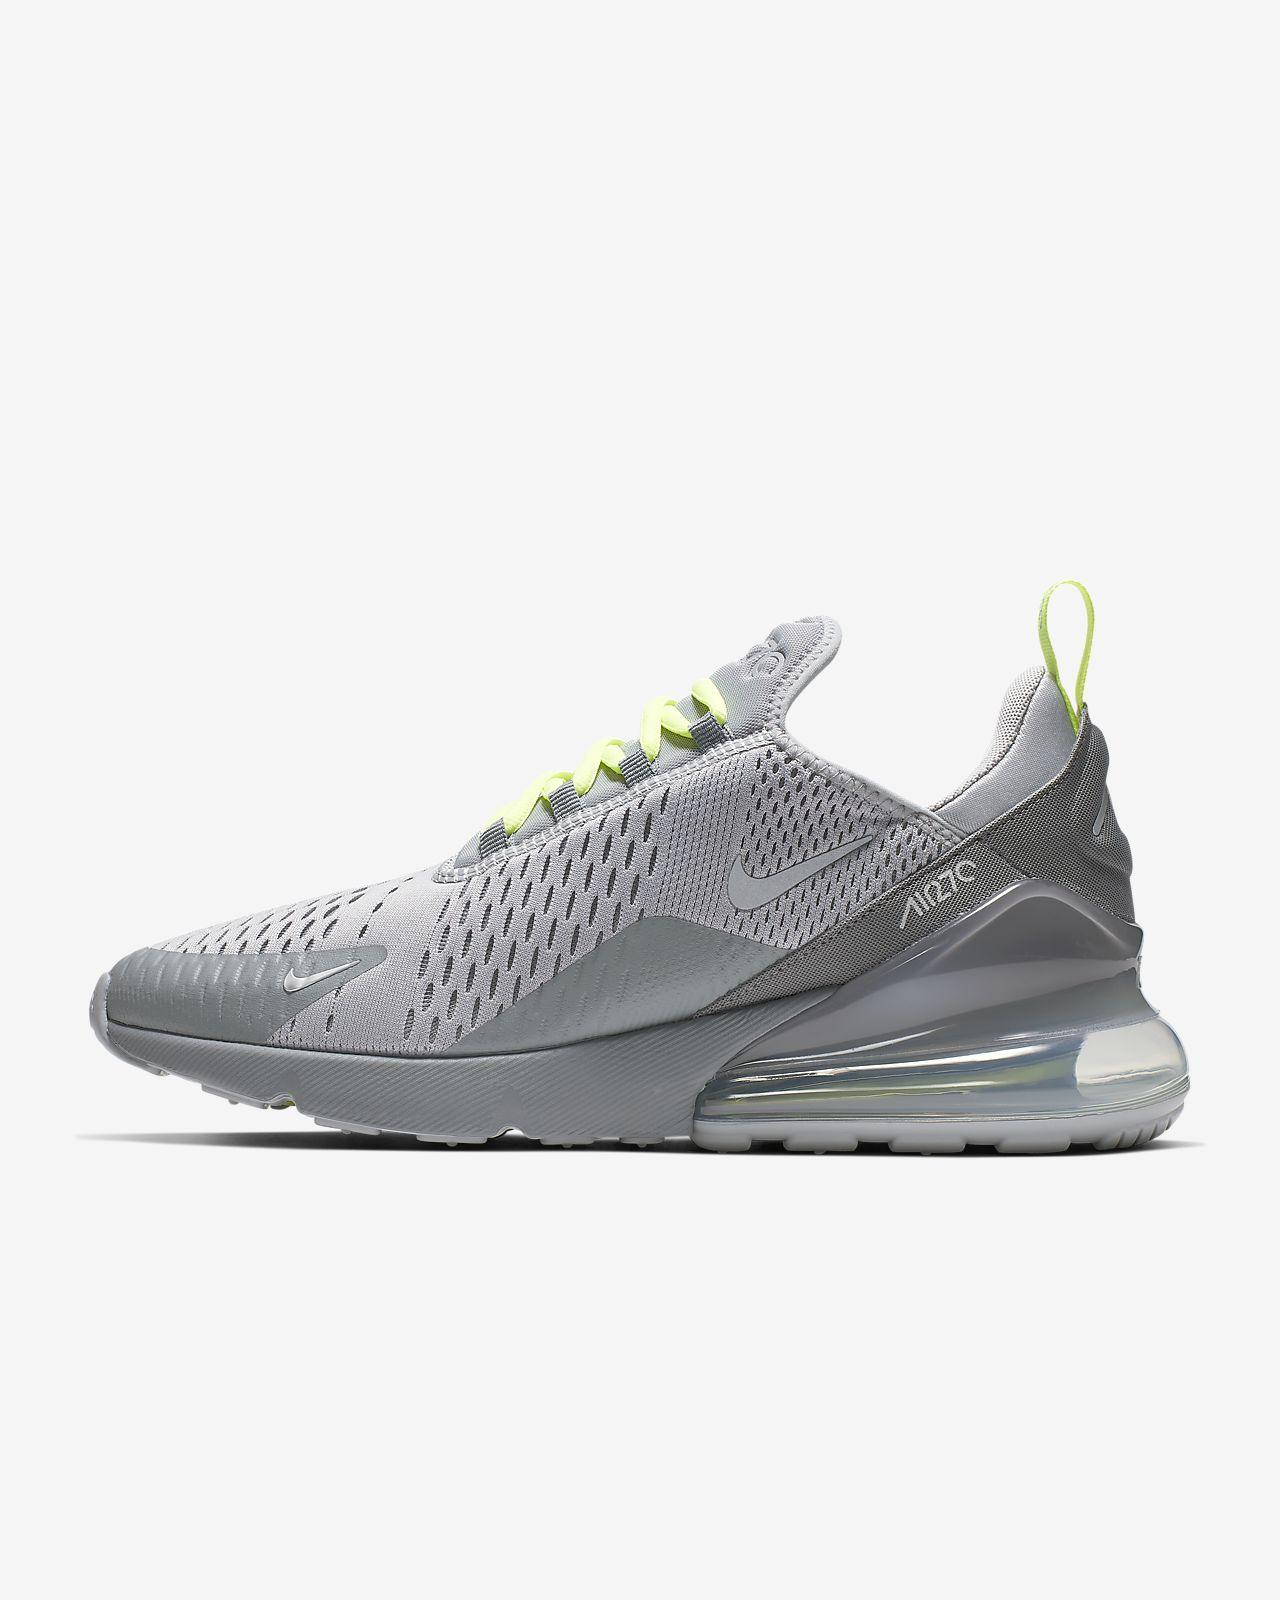 cheap for discount 2feb7 01414 ... Chaussure Nike Air Max 270 pour Homme